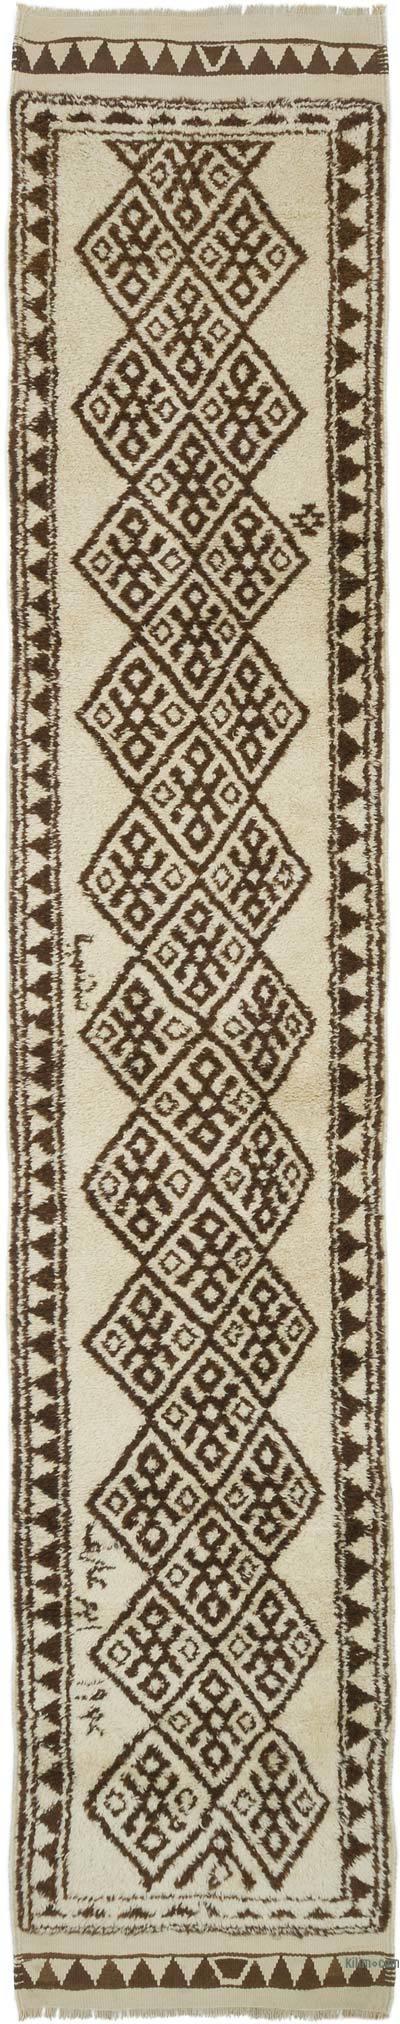 "Beige, Brown Vintage Turkish Runner Rug - 2' 8"" x 14' 1"" (32 in. x 169 in.)"